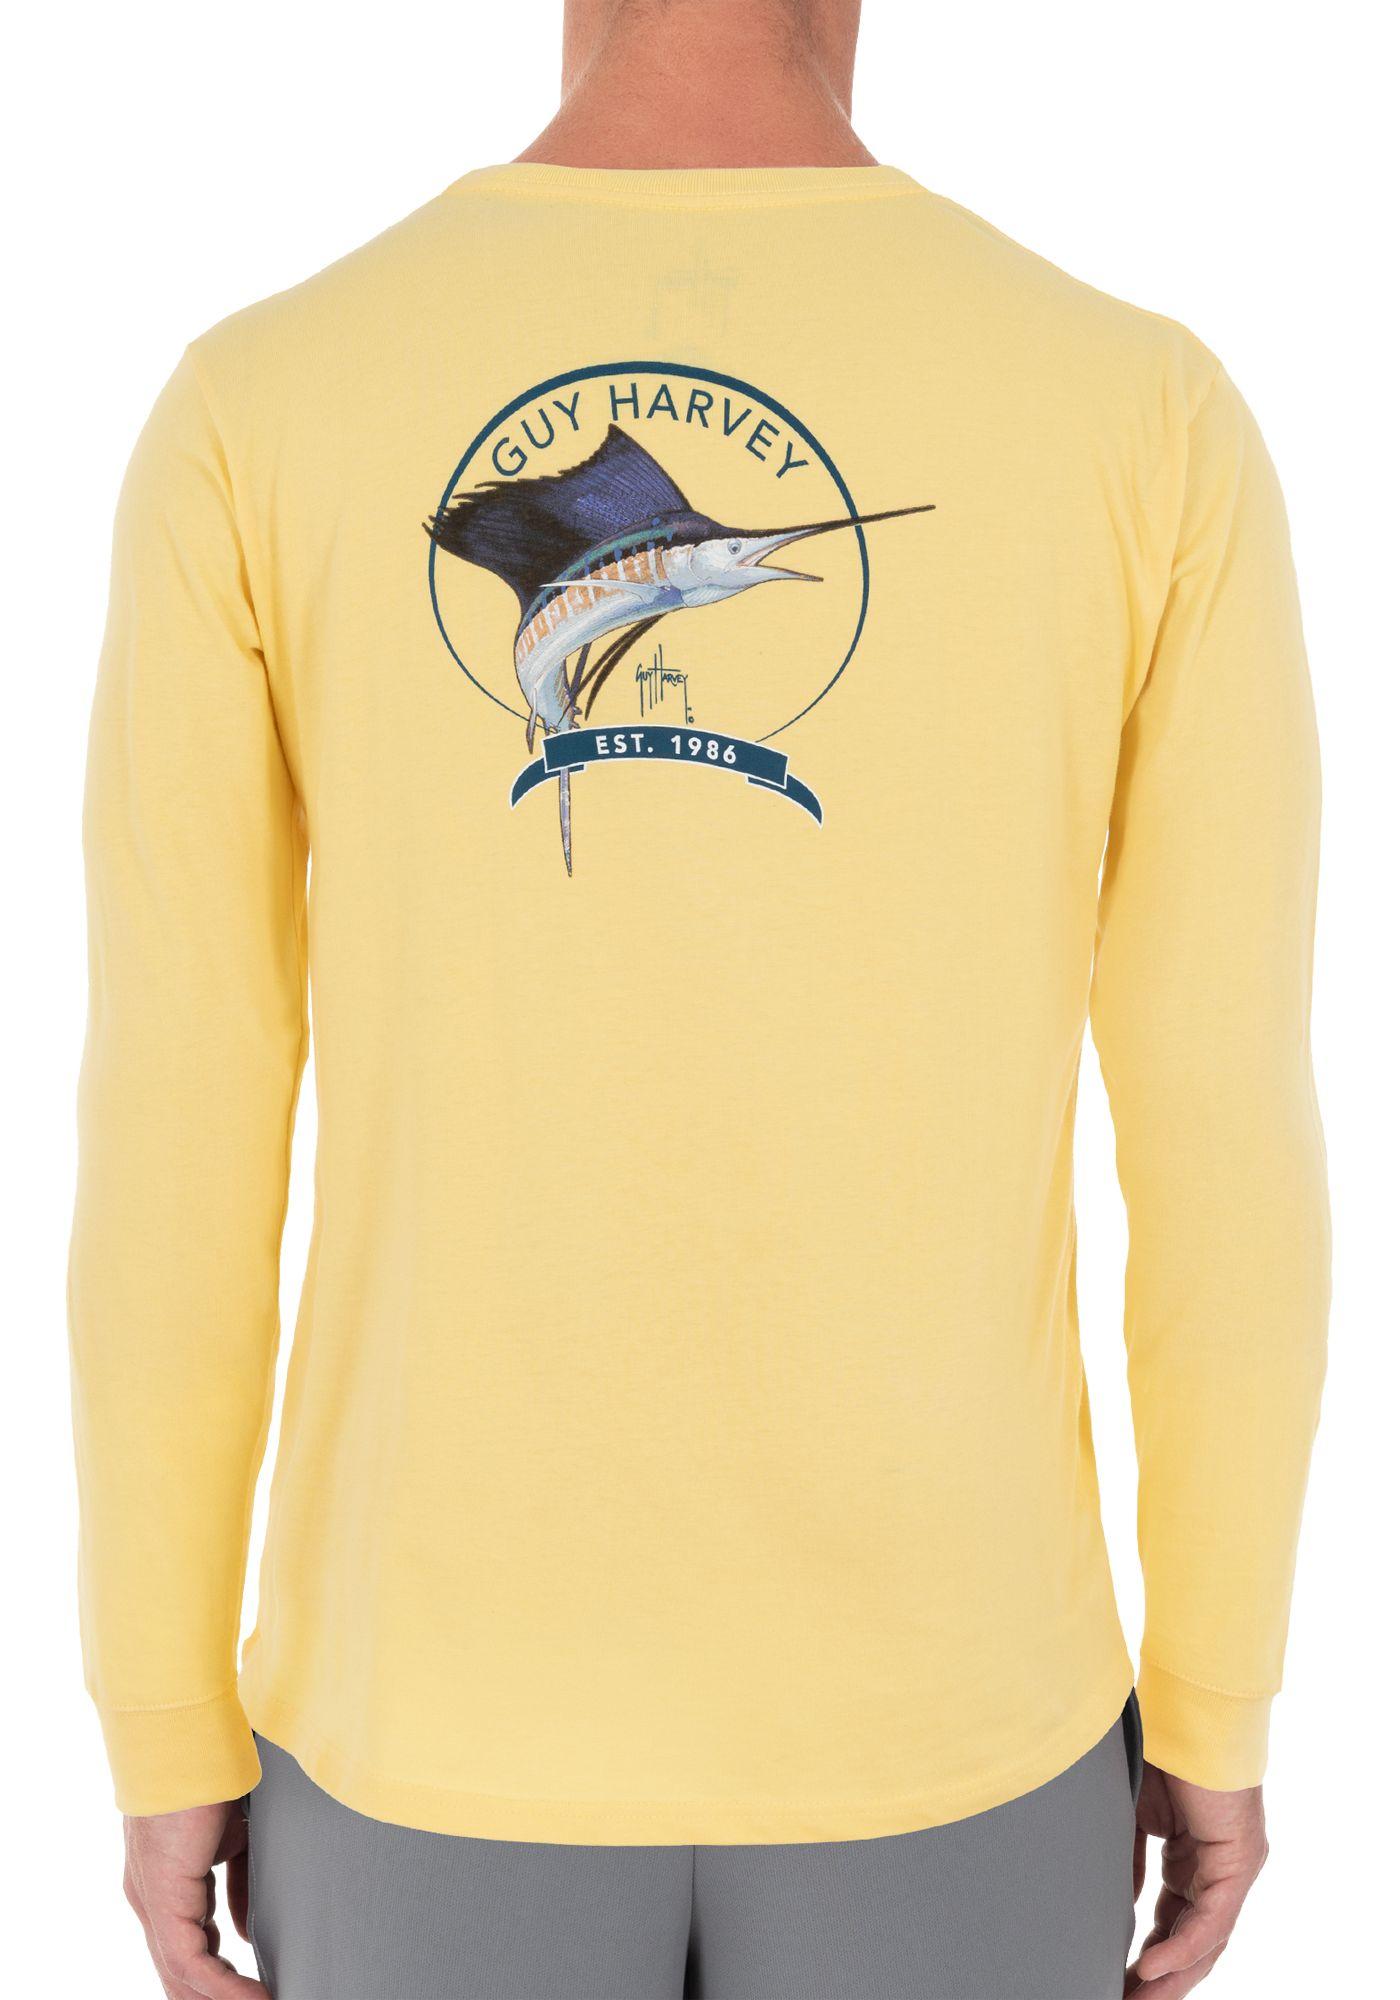 Guy Harvey Men's Core Sailfish Long Sleeve Shirt